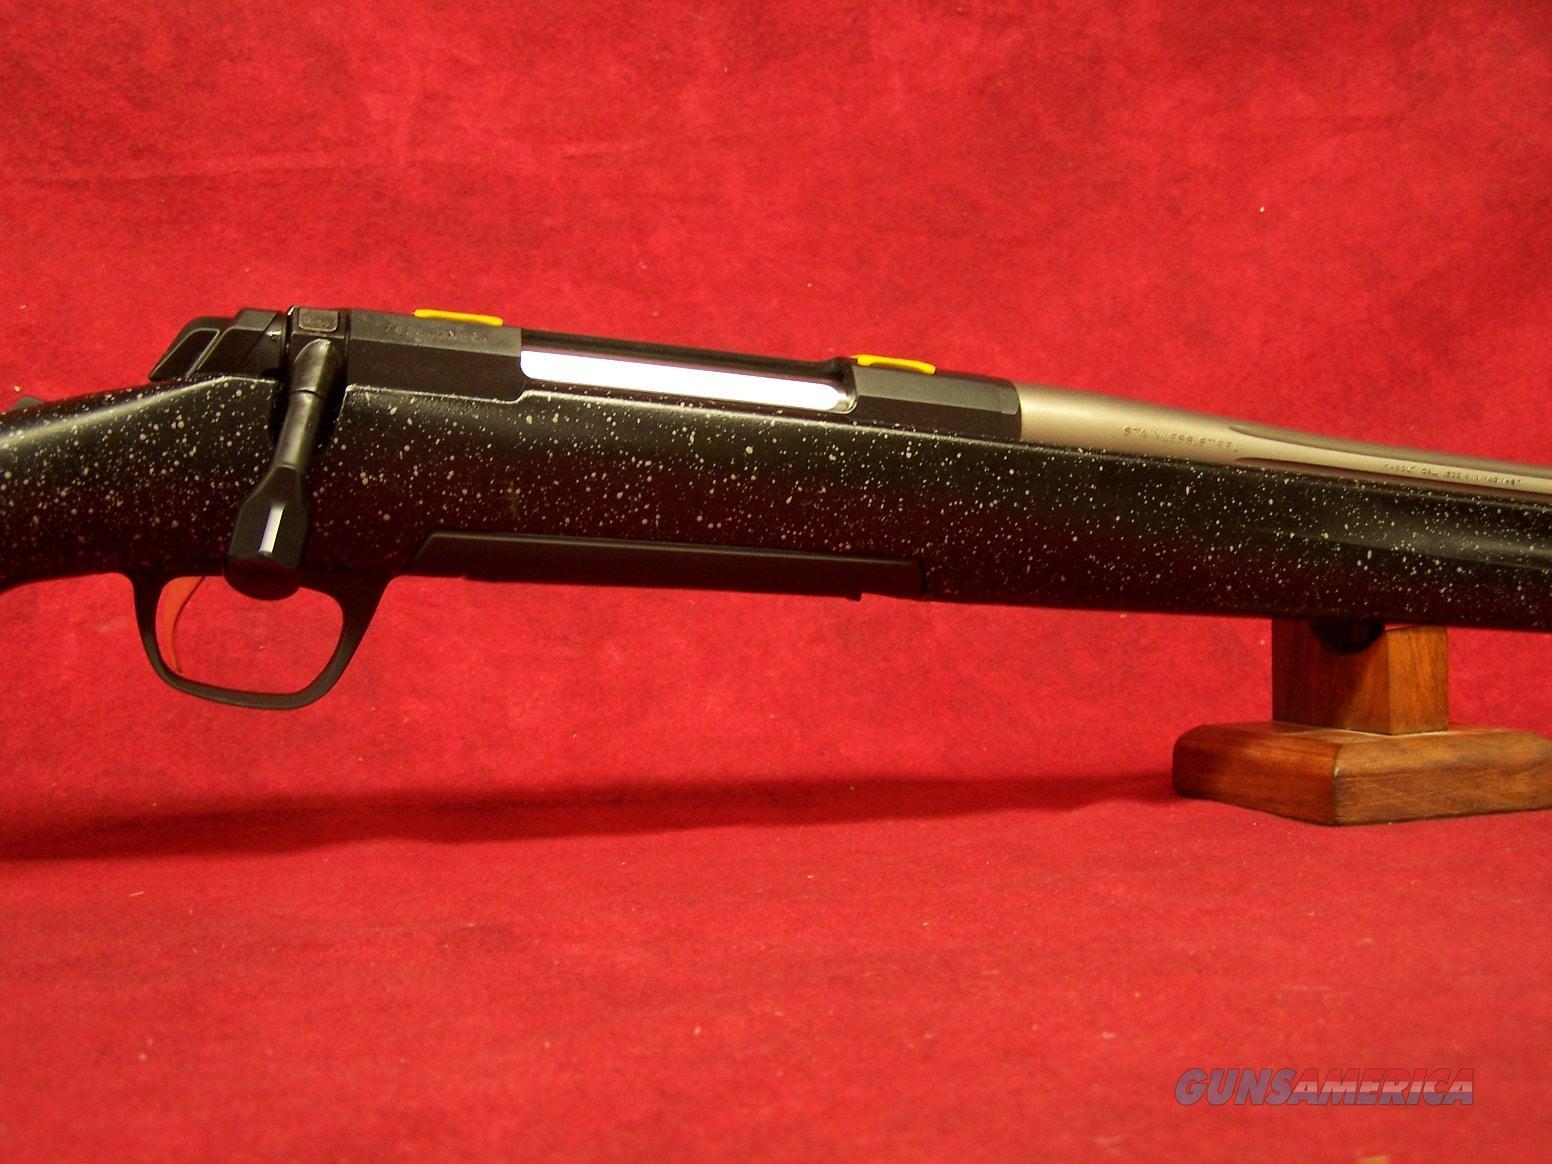 "Browning X-Bolt Max Long Range .300 Win Mag 26"" (035438229)  Guns > Rifles > Browning Rifles > Bolt Action > Hunting > Stainless"